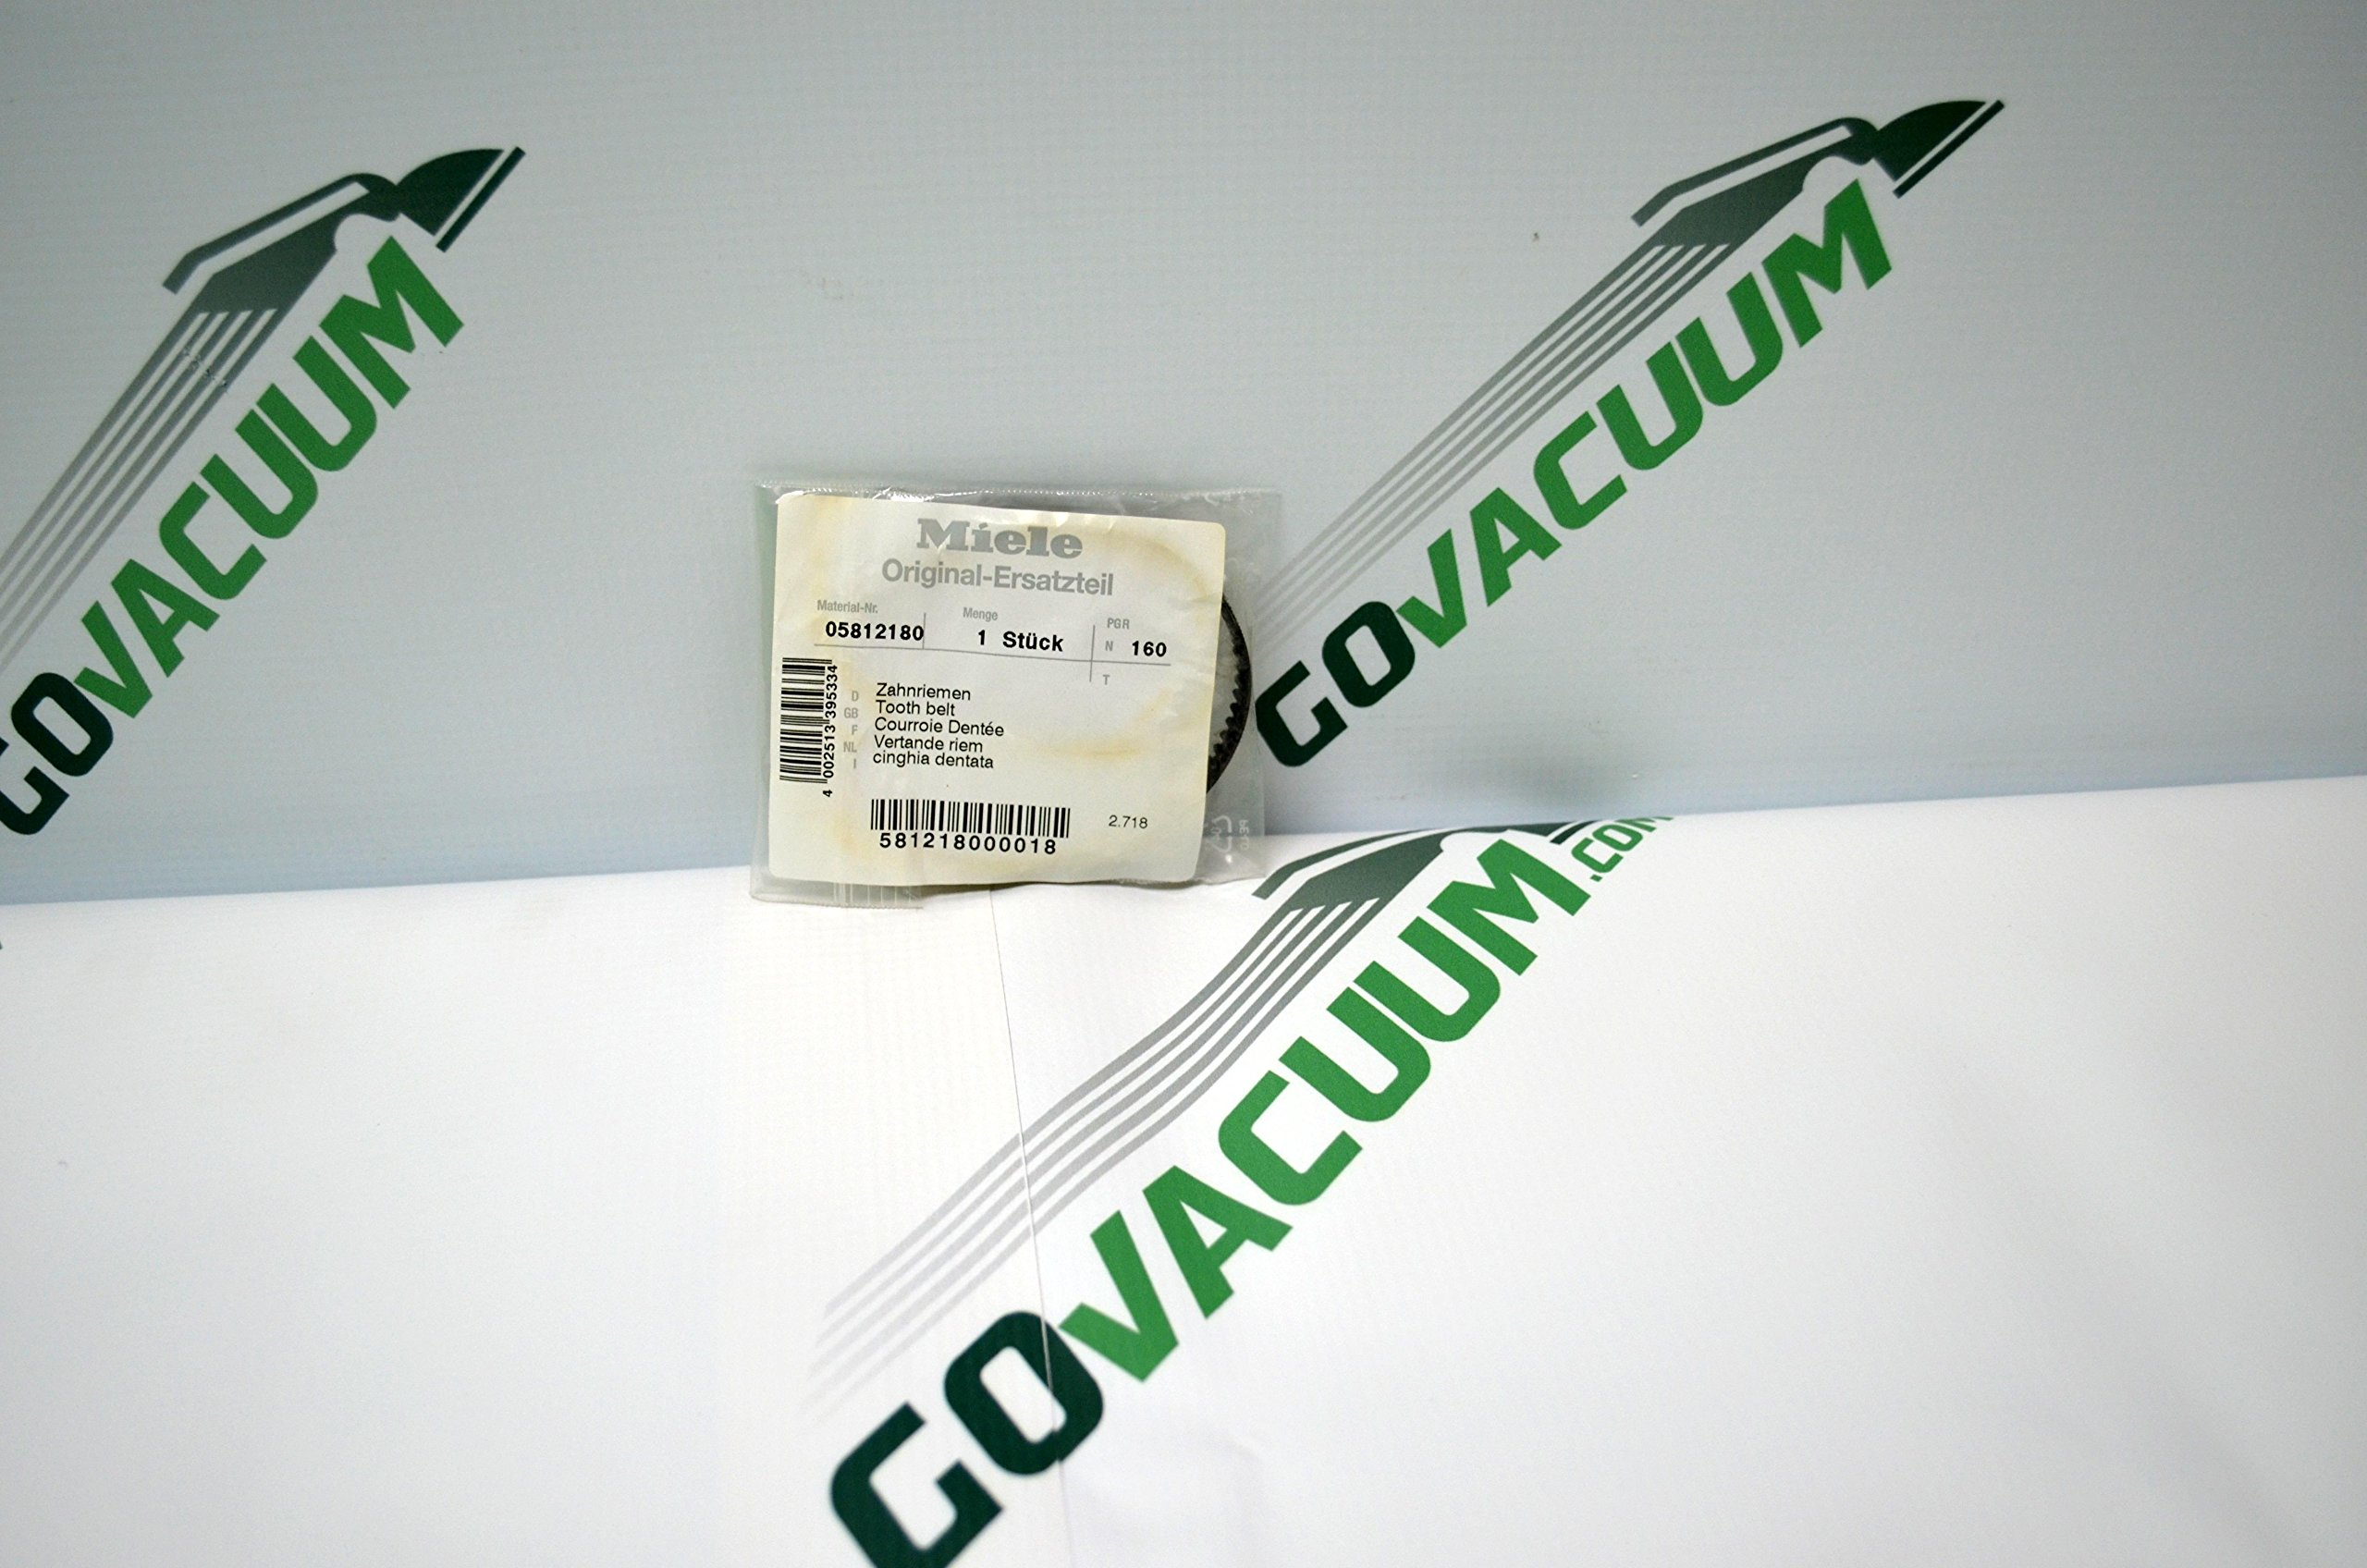 Miele Original Tooth Belt Made for Miele Seb234, Seb236 Power Head Vacuum Cleaner. Part# 05812180